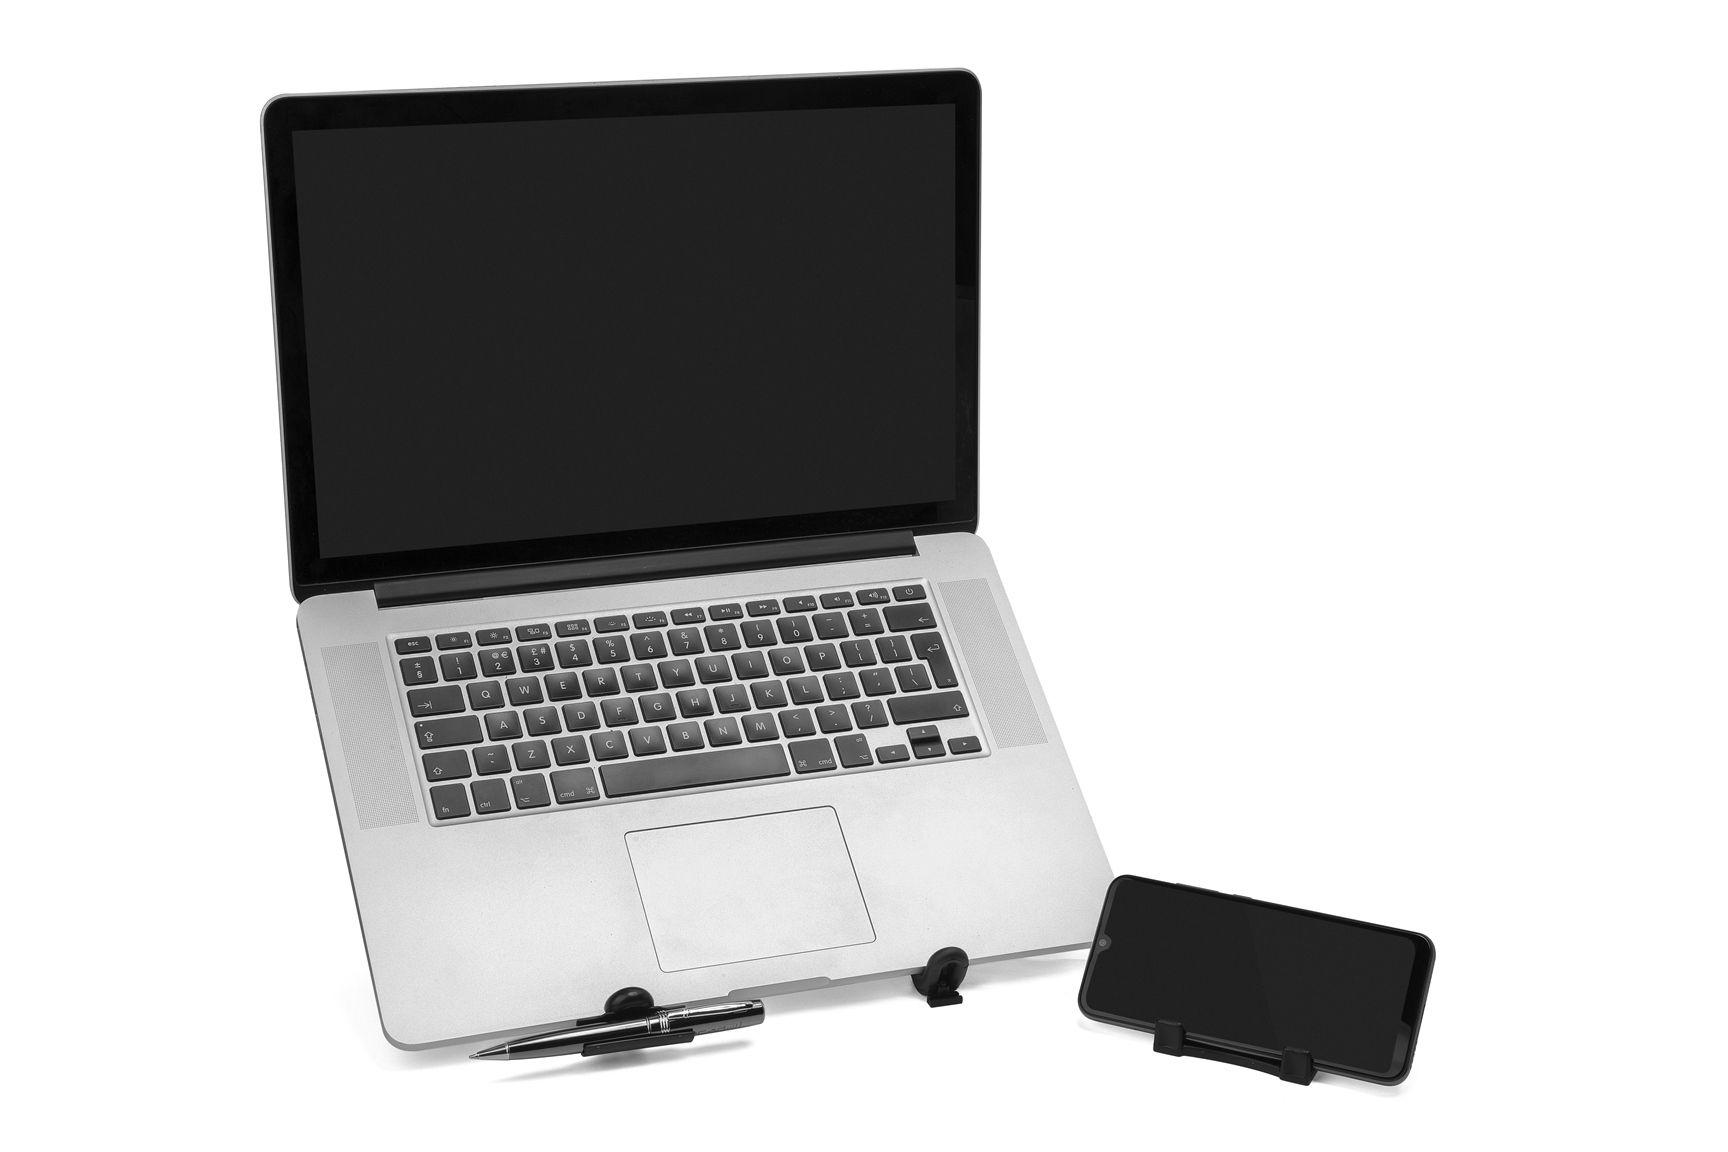 Kit 2 Suporte Universal Para Notebook Netbook Tablet Ergonômico